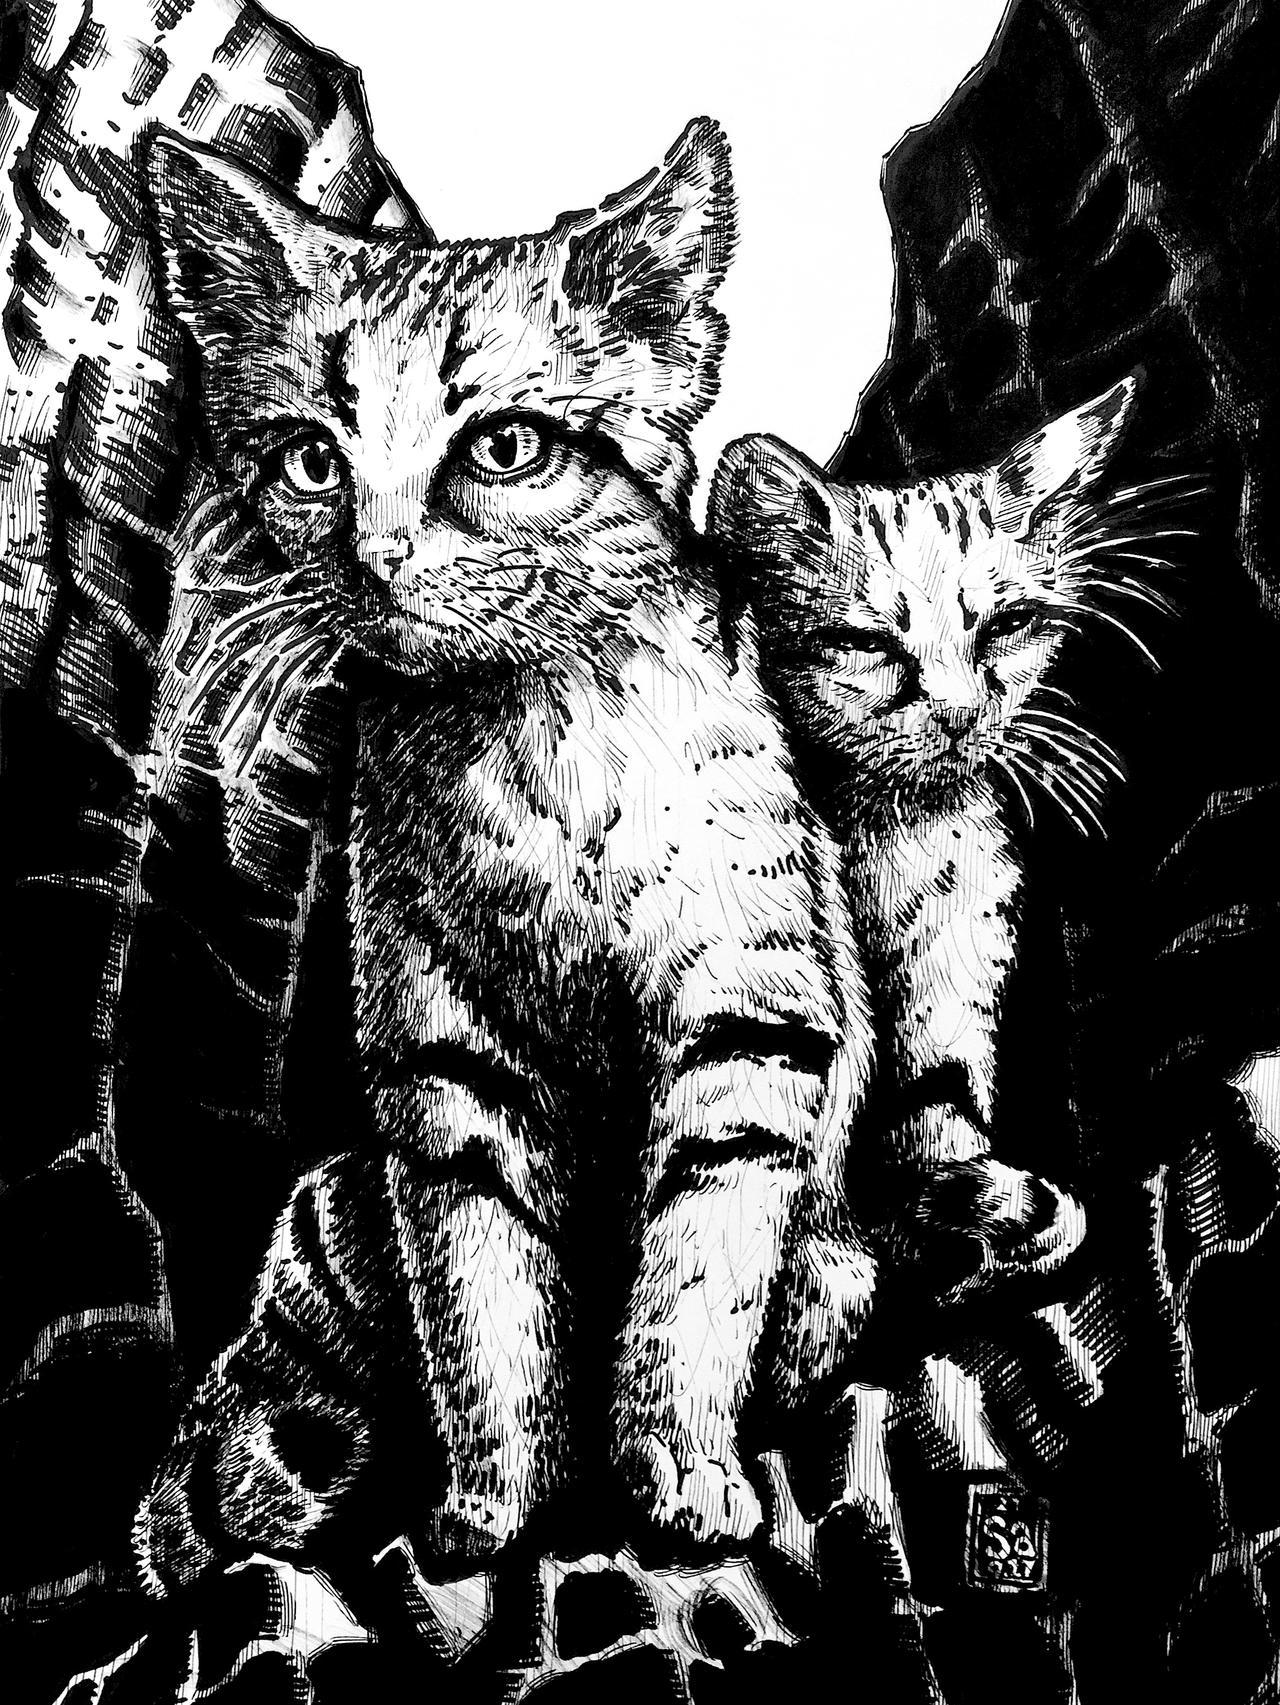 Sand Cats (Felis margarita)